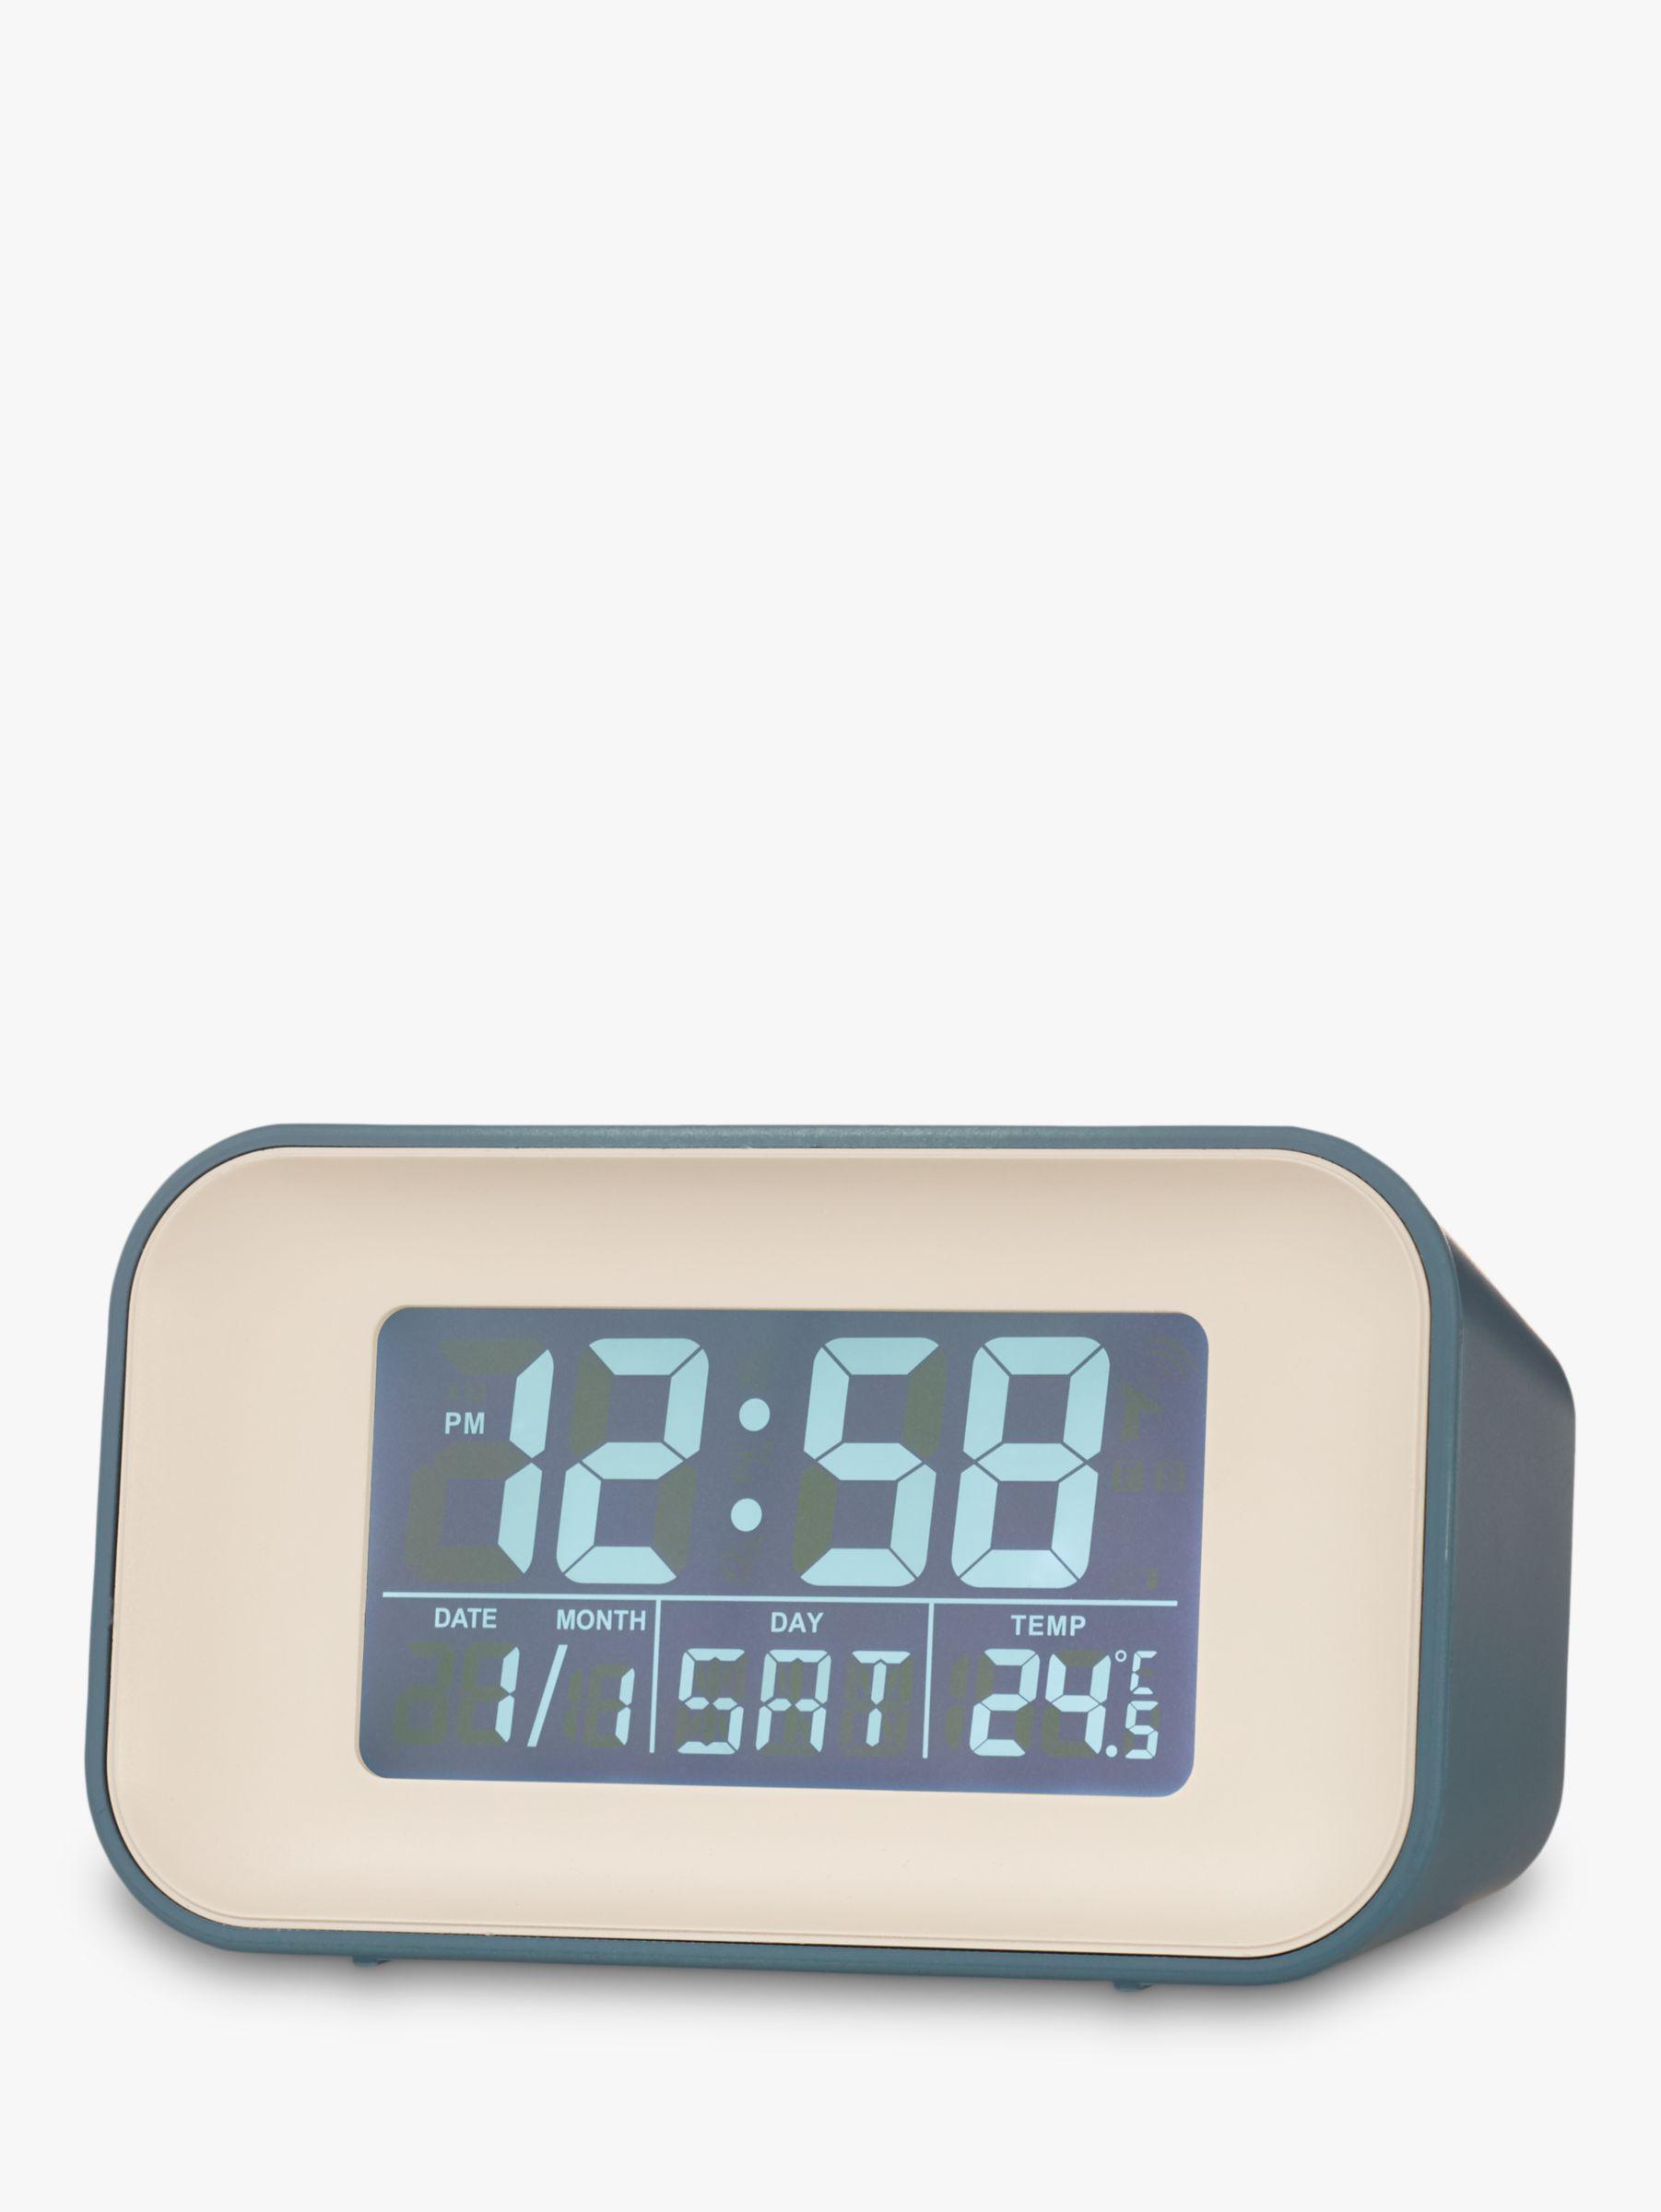 Acctim Acctim Reflection Display LCD Digital Alarm Clock